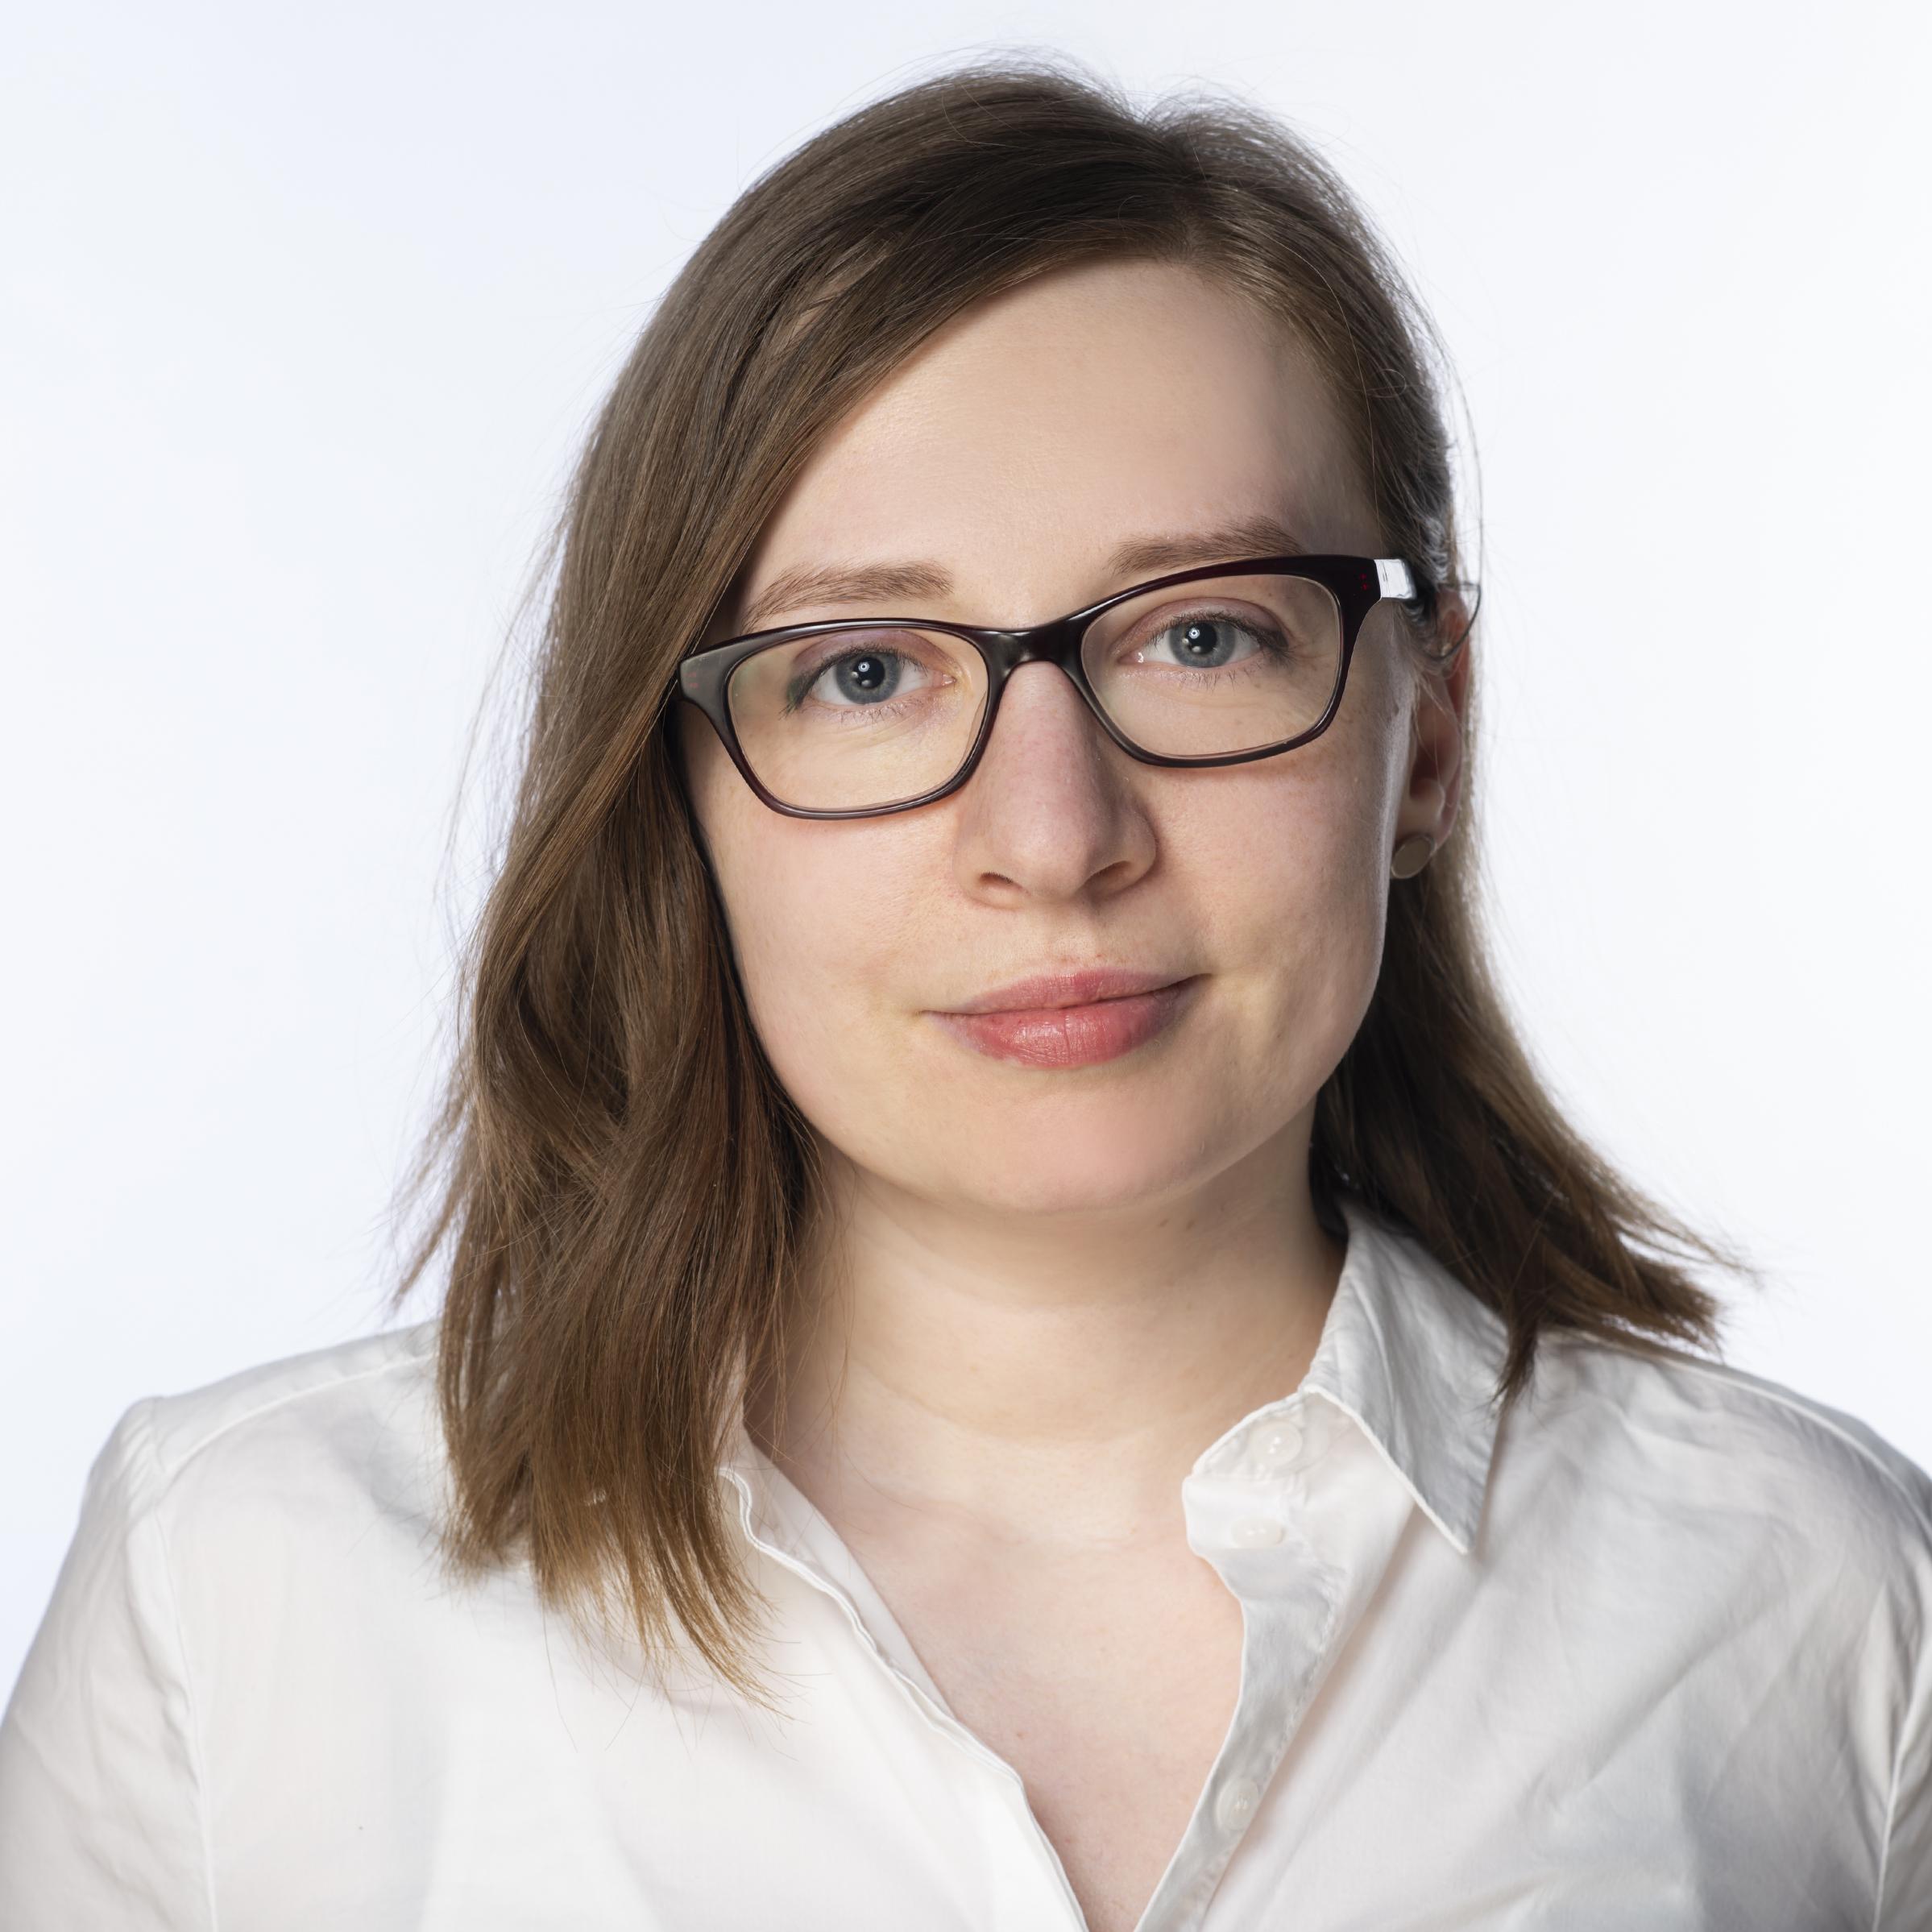 Andrea Holstein - Bachelor of arts in Innenarchitektur (FH)+49 441 7792922andrea.holstein@inspace.de